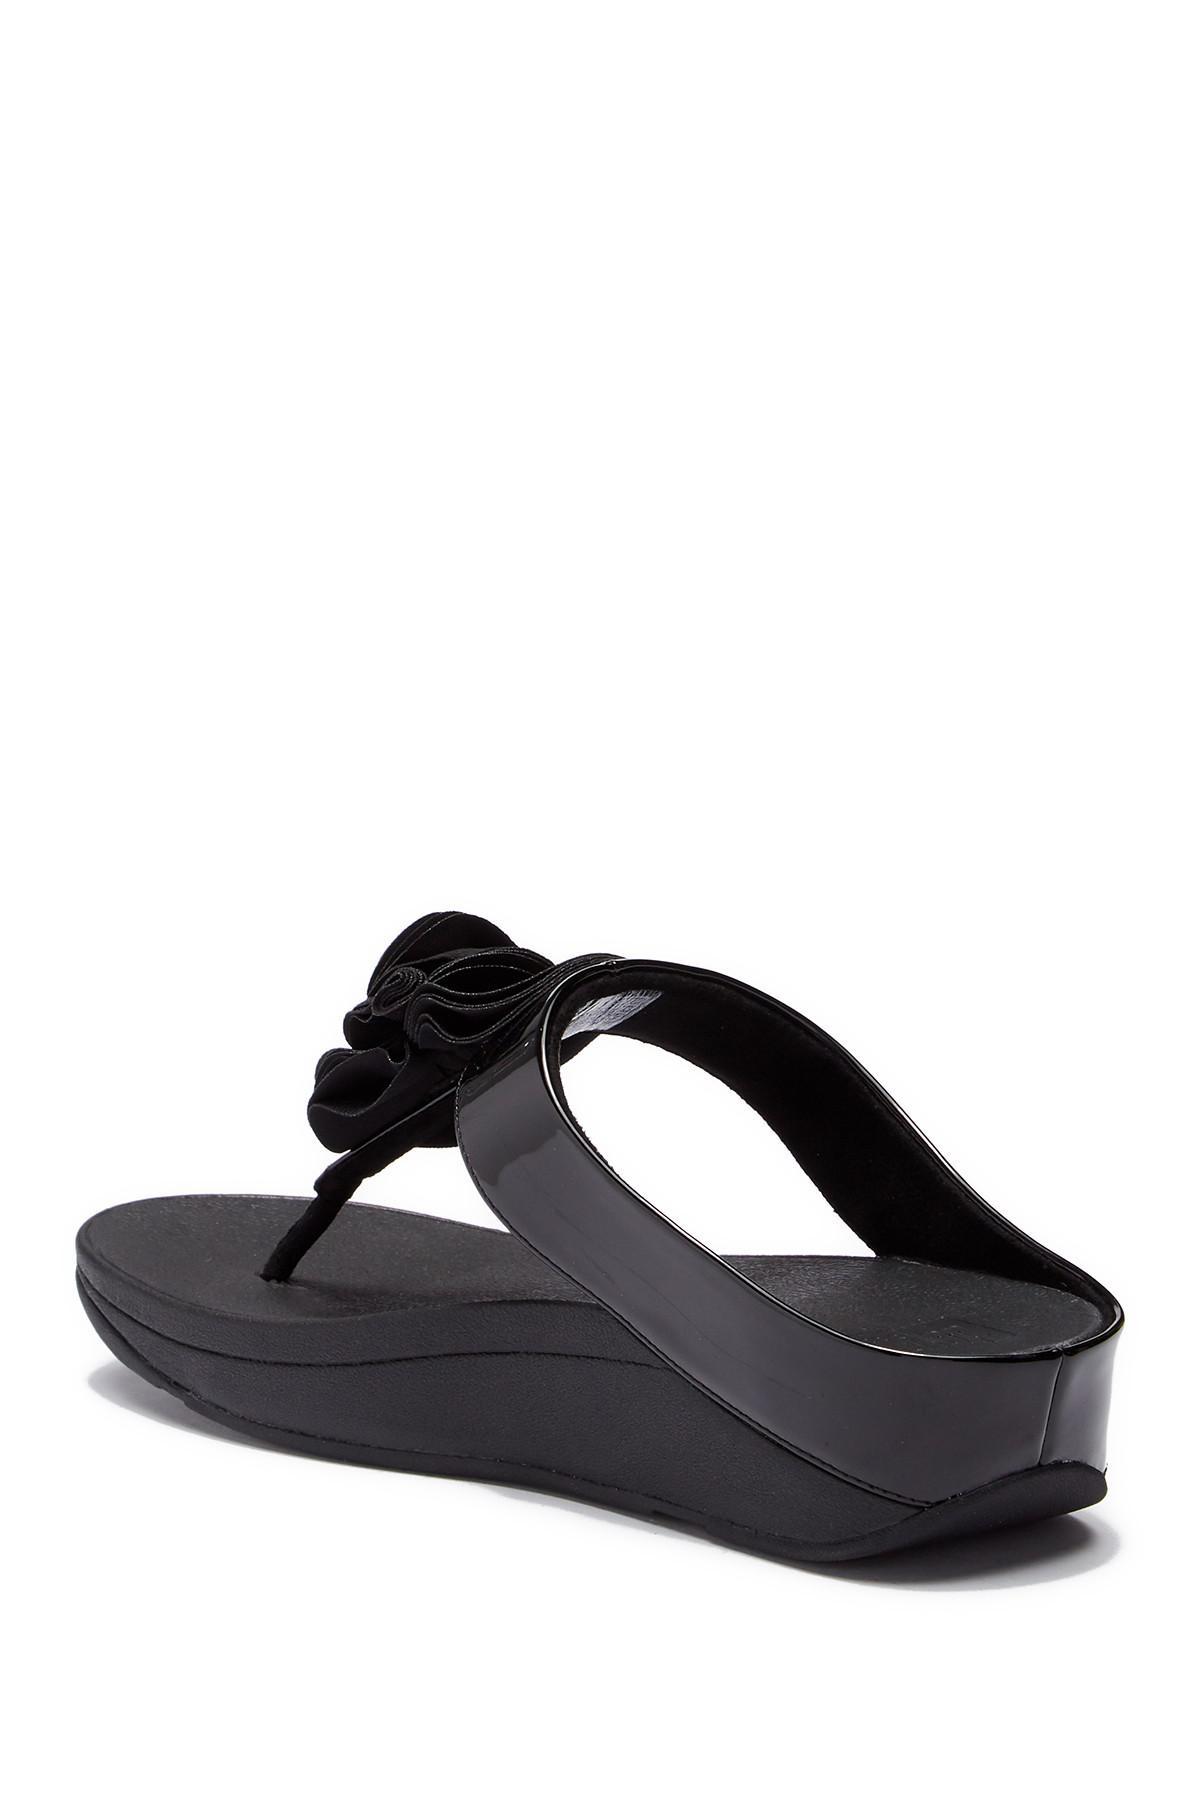 1902c49a078da0 Lyst - Fitflop (tm) Florrie Sandal in Black